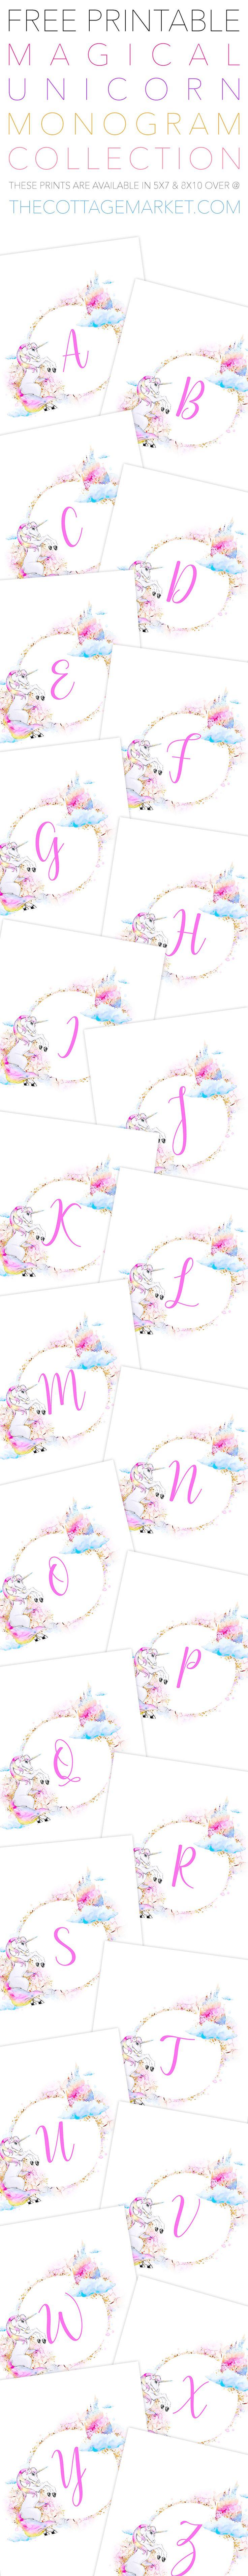 Best 25+ Free printable monogram ideas on Pinterest | Printable ...